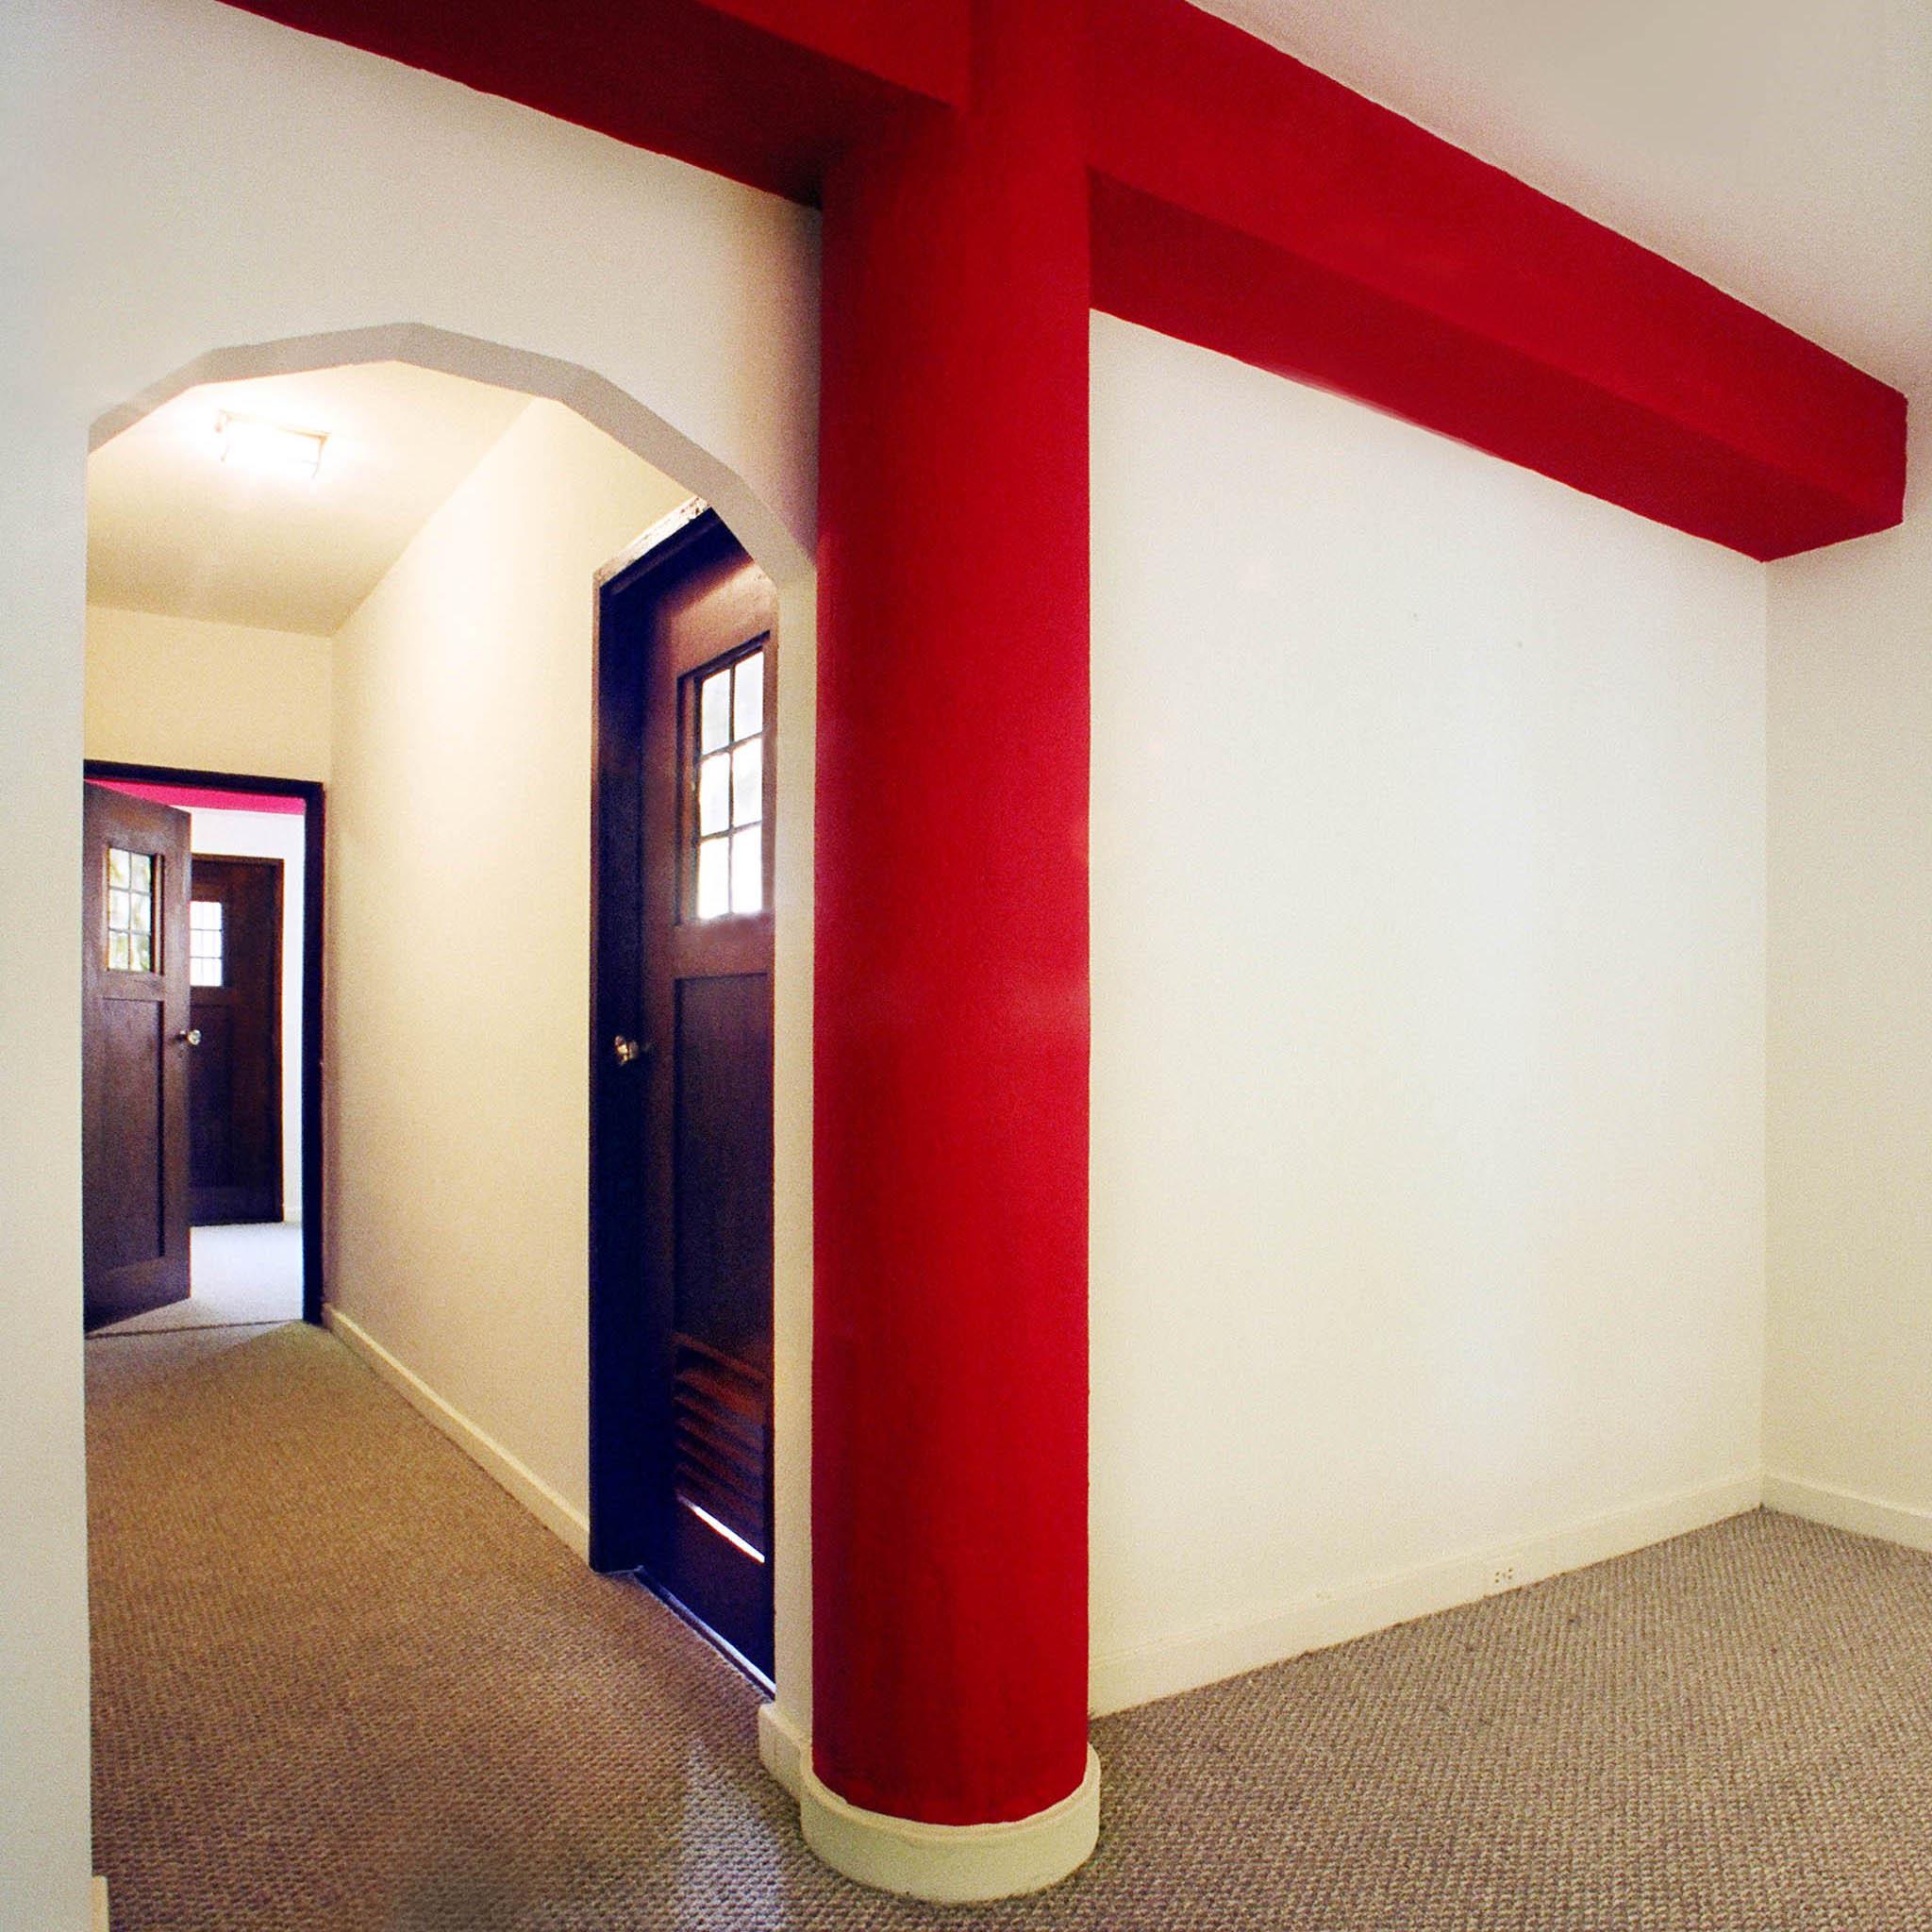 interior of 342 S. Highland Ave, Apt. 14A 3